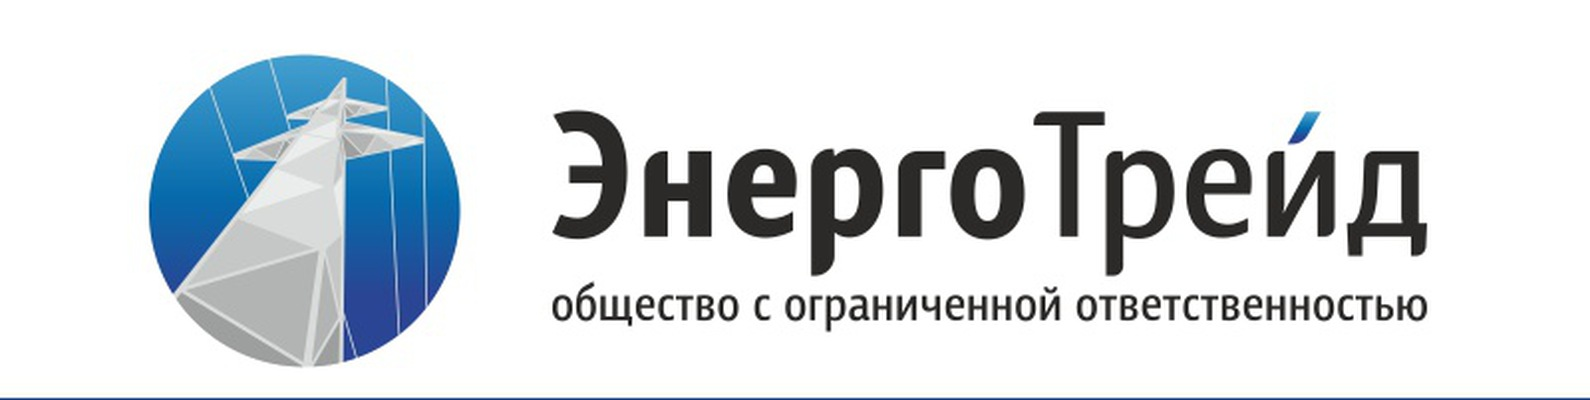 Dealership Agreement was entered into between Energokomplekt ООО (Ltd.) and EnergoTrade ООО (Ltd.)